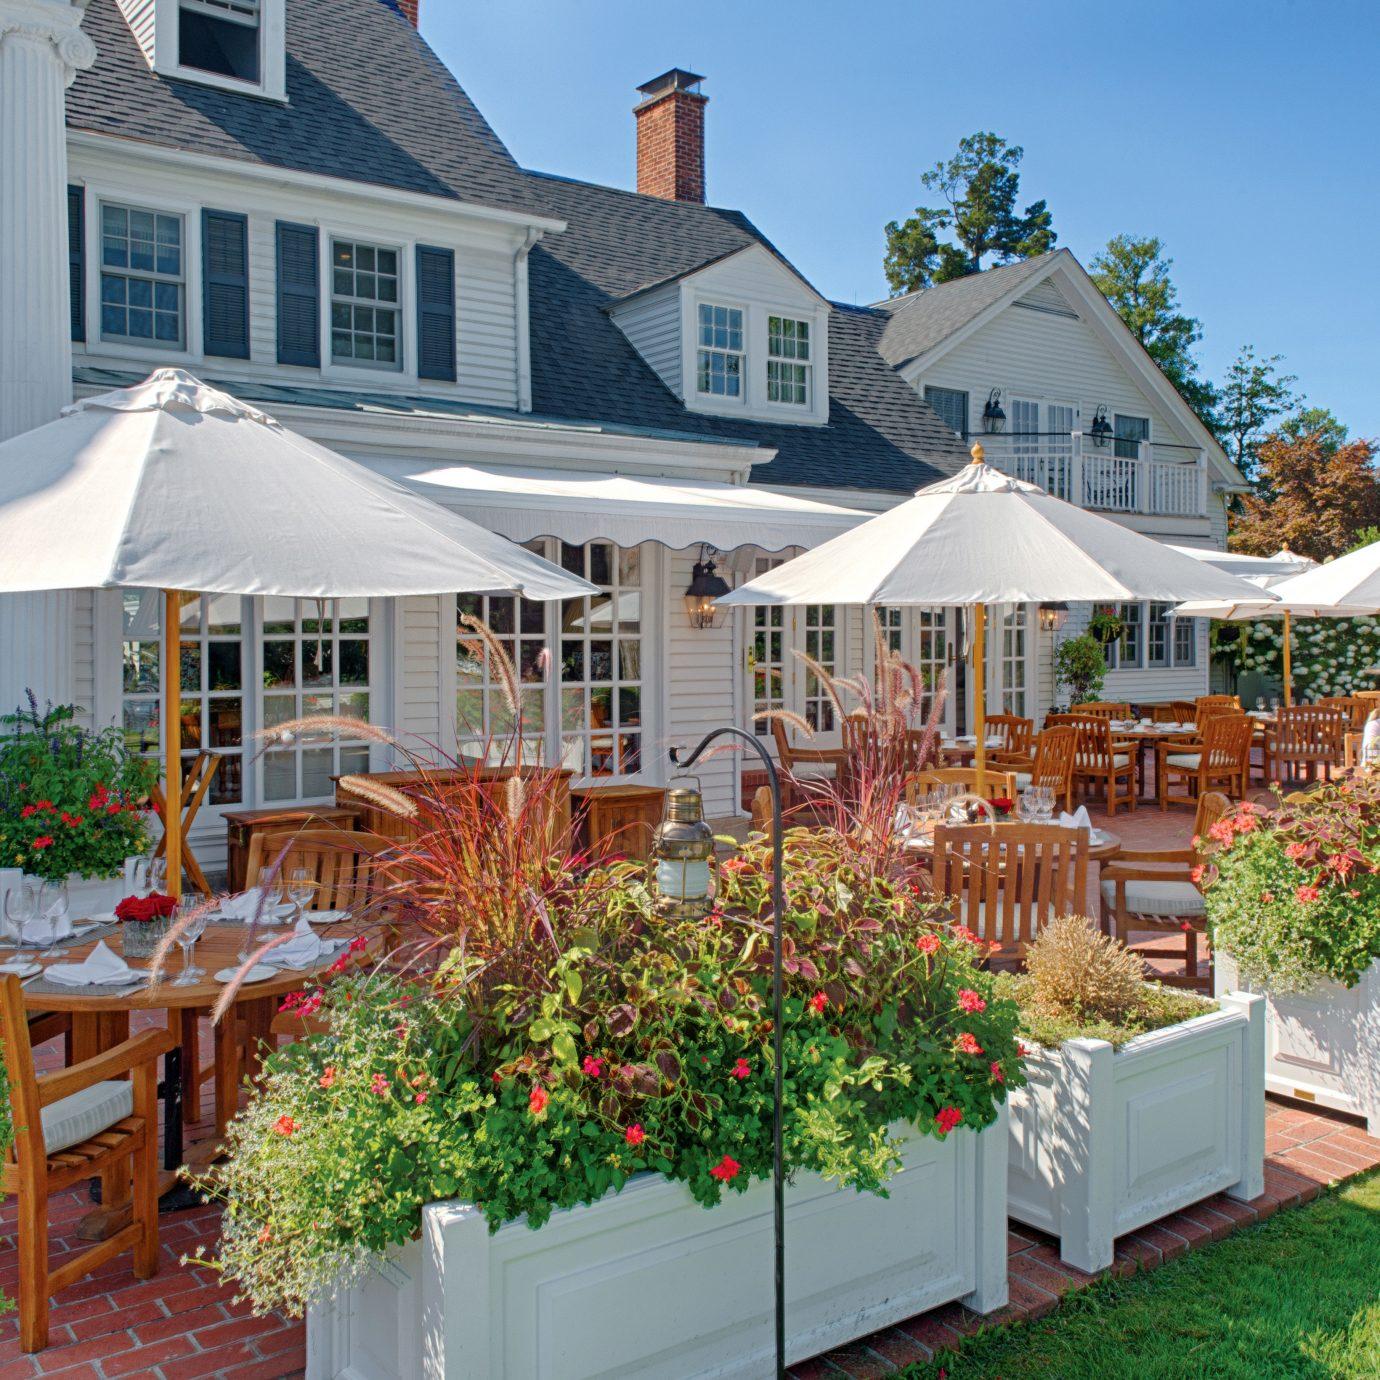 Classic Deck Dining Elegant Historic Inn building grass property house backyard home lawn Garden cottage Resort outdoor structure yard set